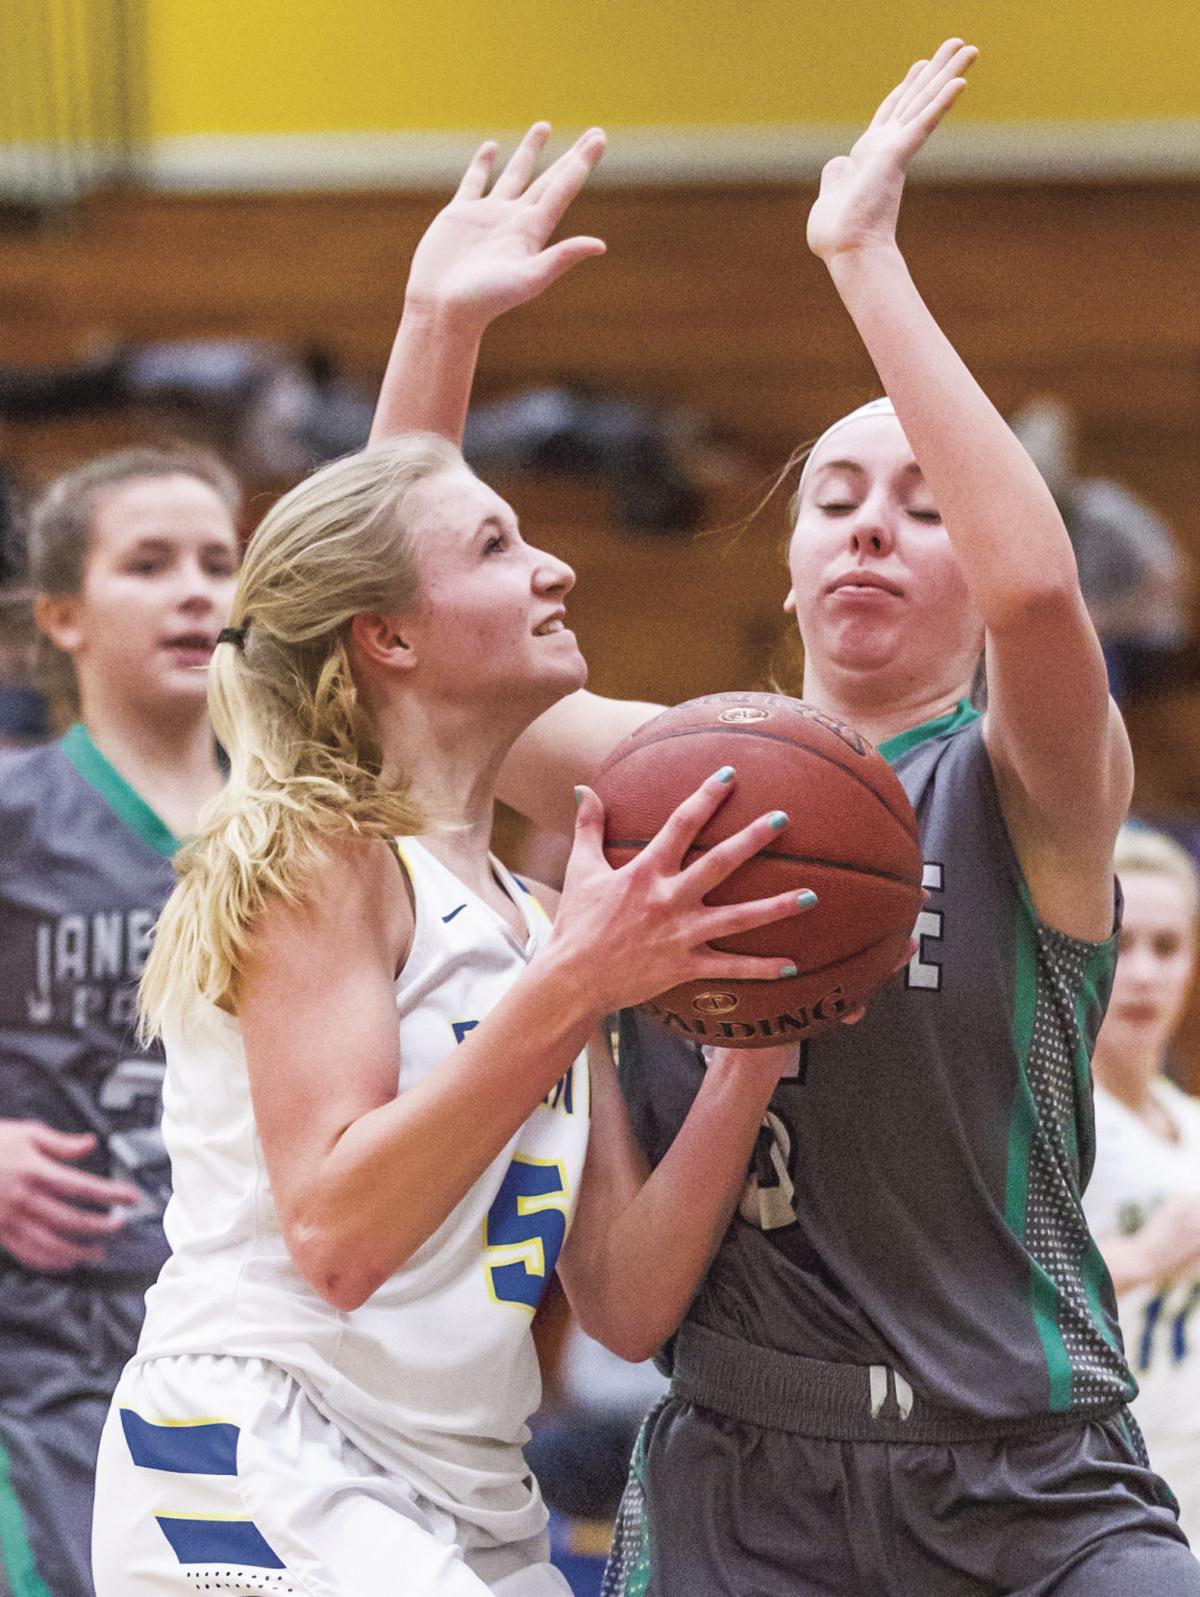 Prep girls basketball: Madison West's Kaitlin Manke drives past Janesville Parker's Julia Hartwig